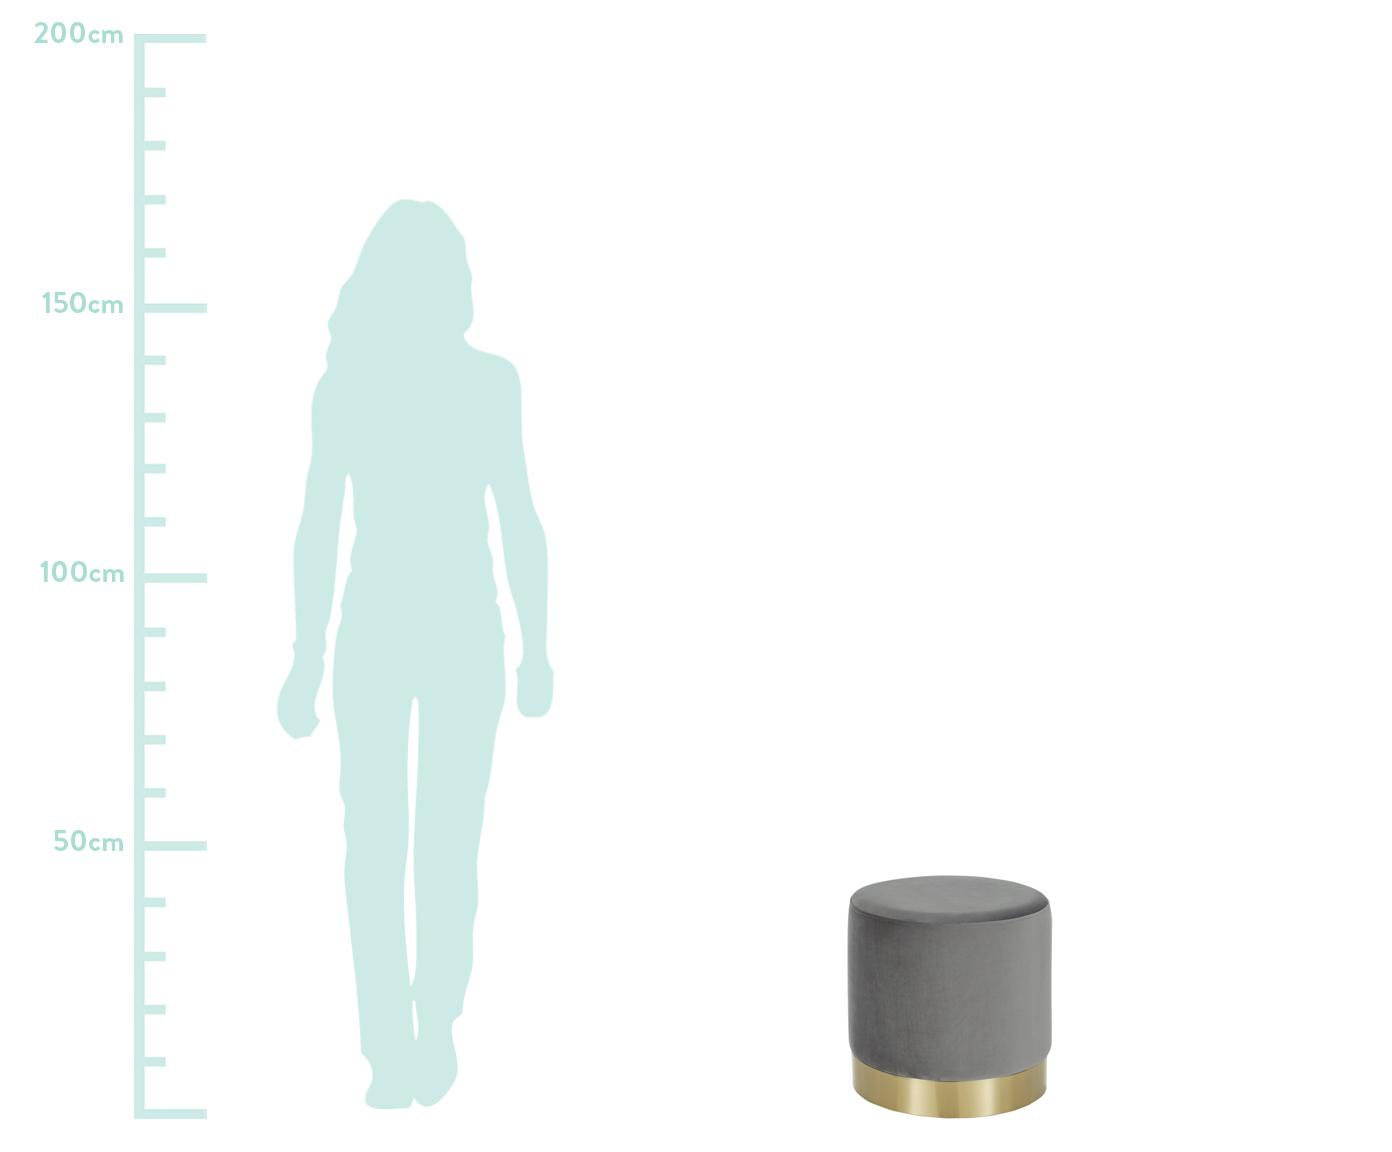 Samt-Hocker Orchid, Bezug: Samt (Polyester) Der hoch, Rahmen: Sperrholz, Bezug: Grau Fuß: Goldfarben, Ø 38 x H 38 cm